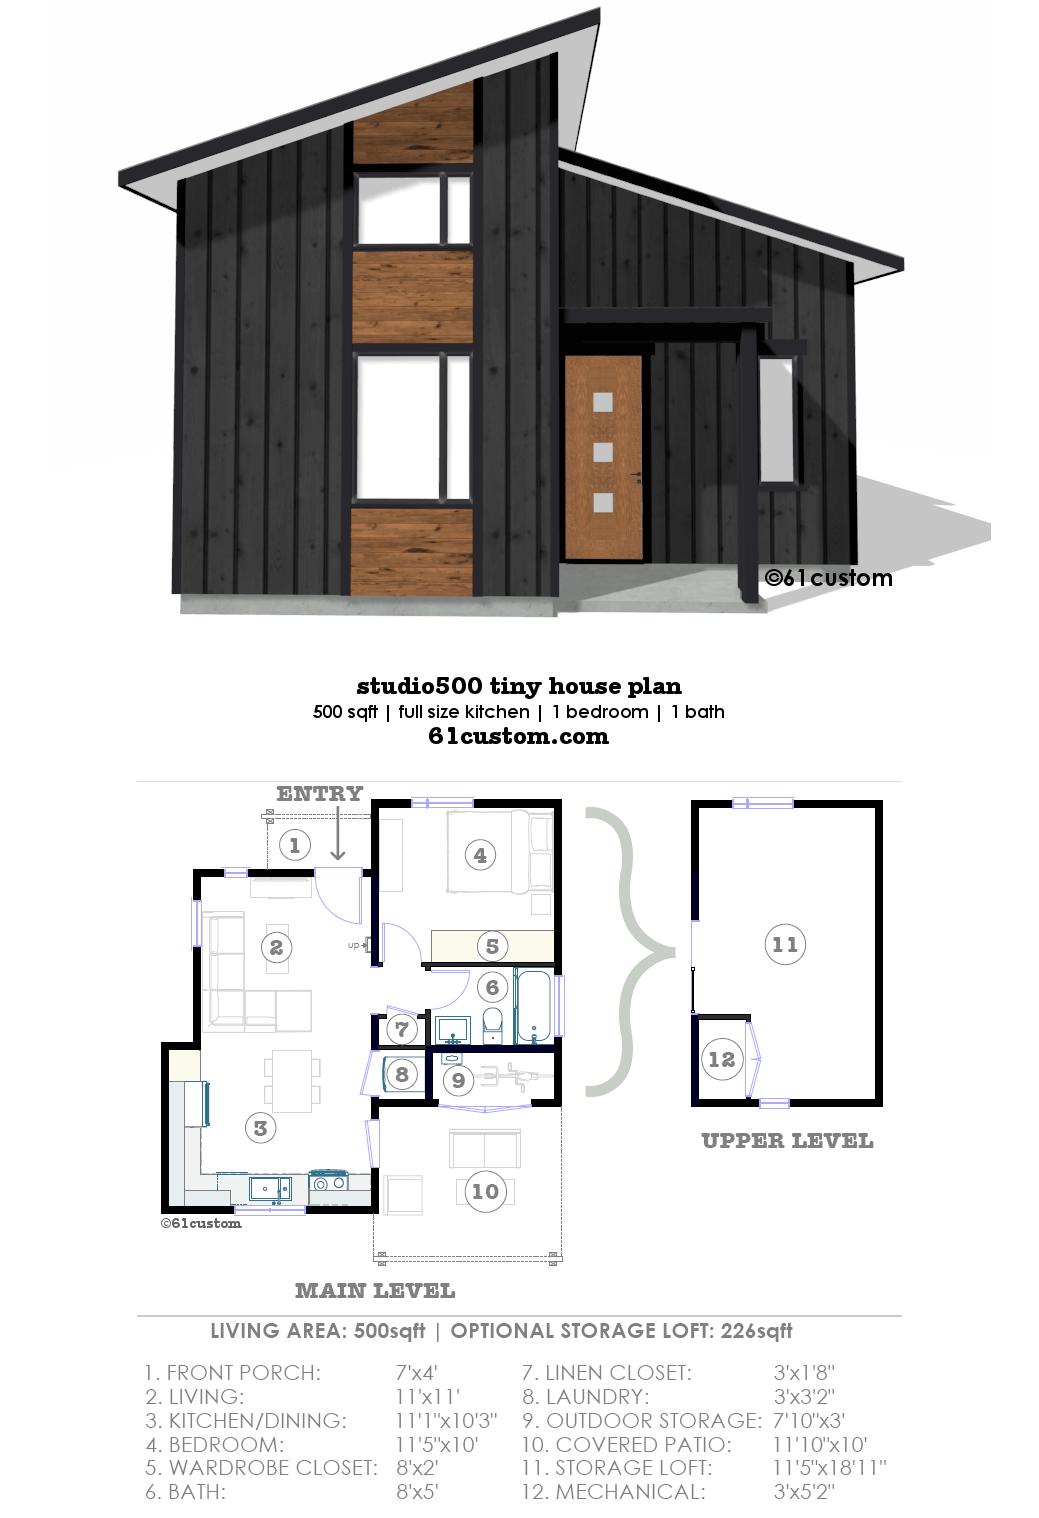 Studio500 tiny house plan 61custom